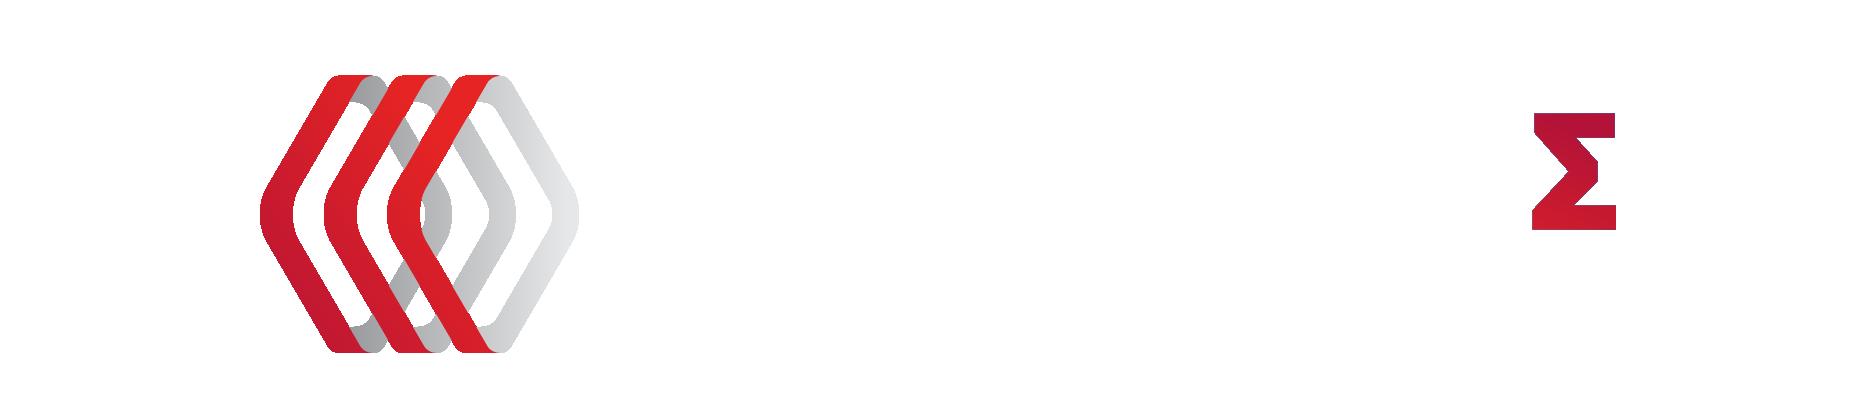 MAILGATES Σ